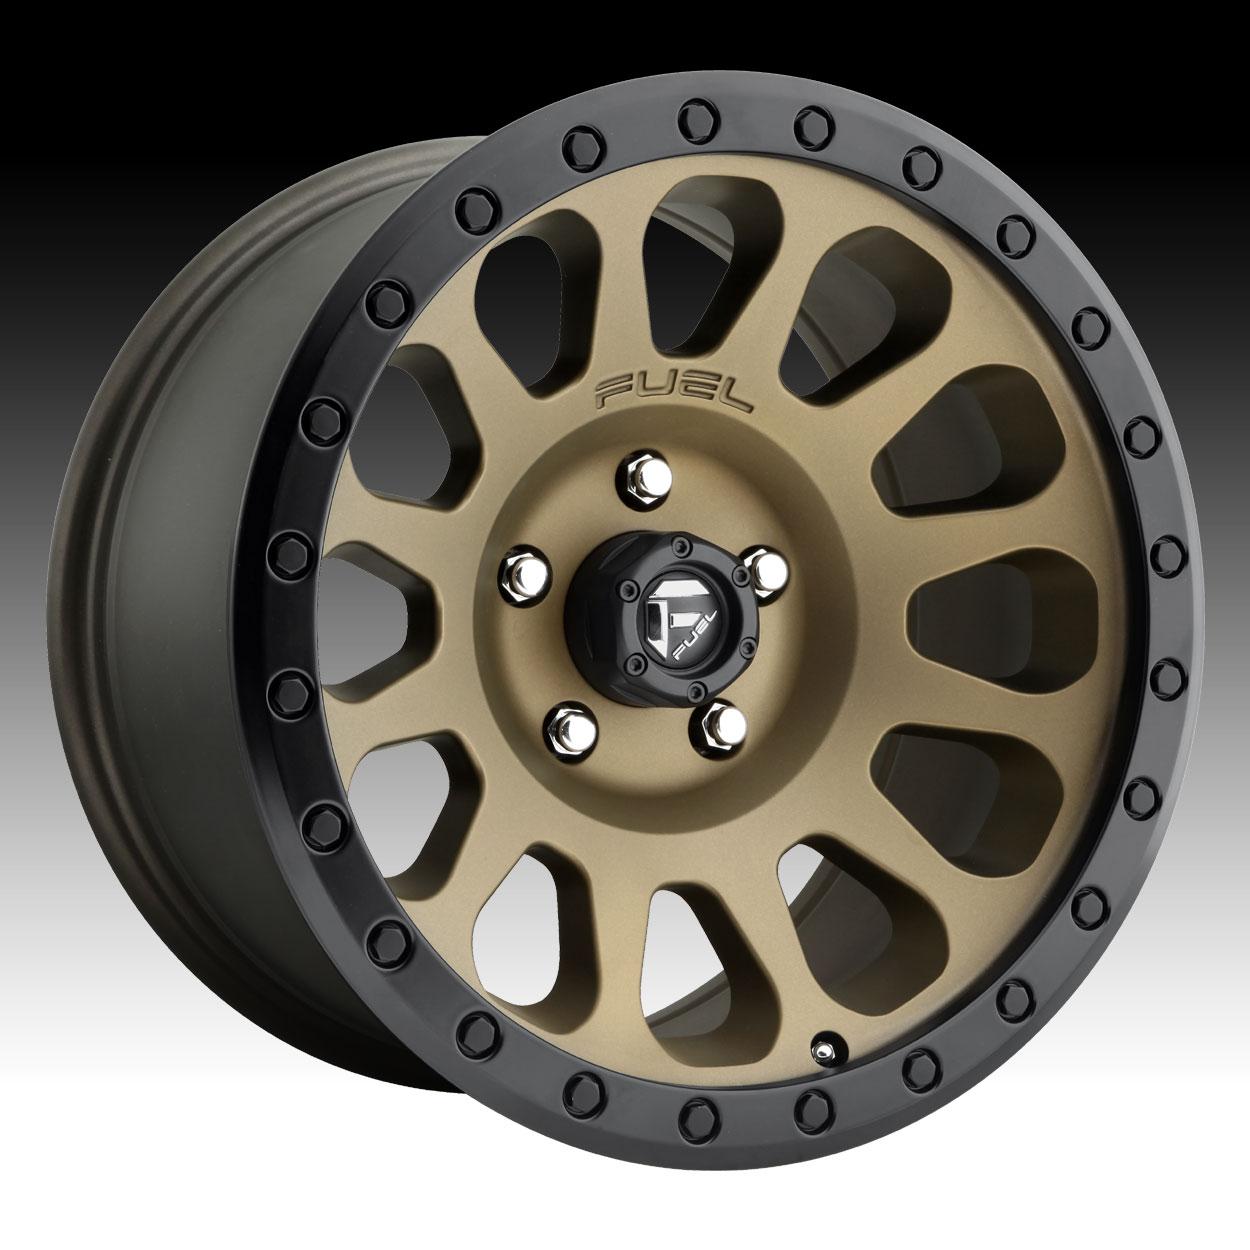 Truck Wheels Rims : Fuel vector d bronze black ring custom truck wheels